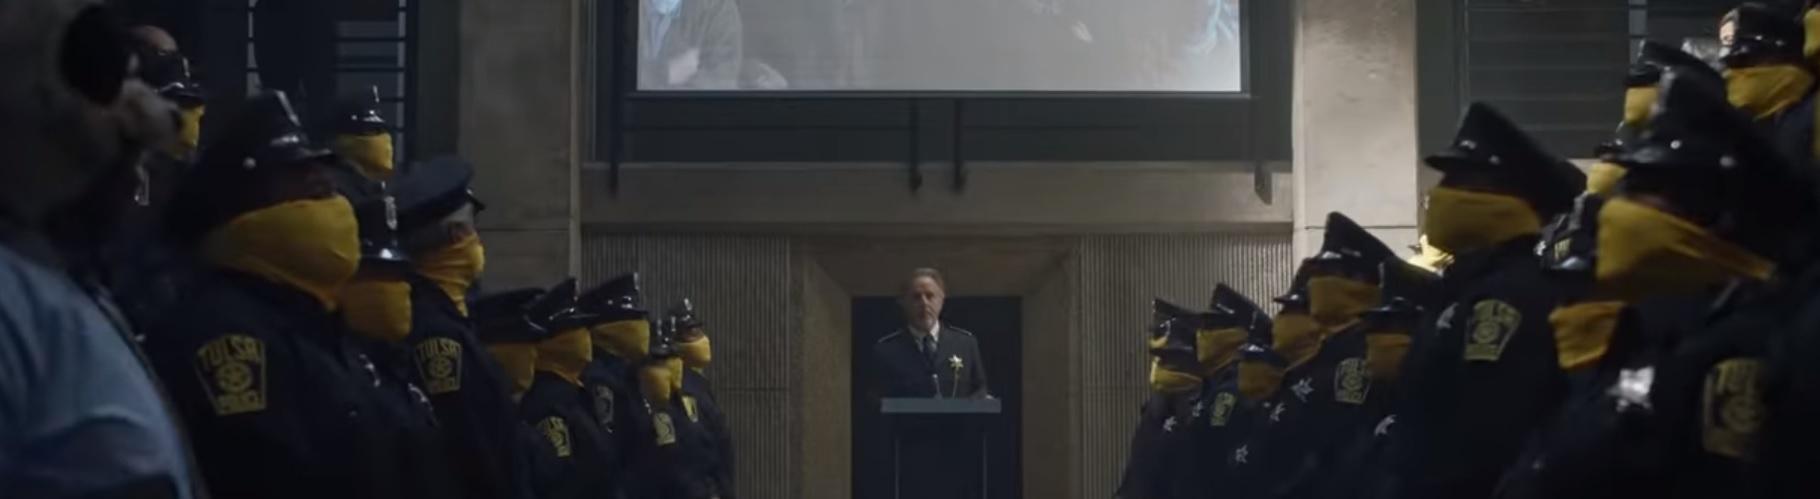 San Diego Comic-Con 2019 - Watchmen Trailer